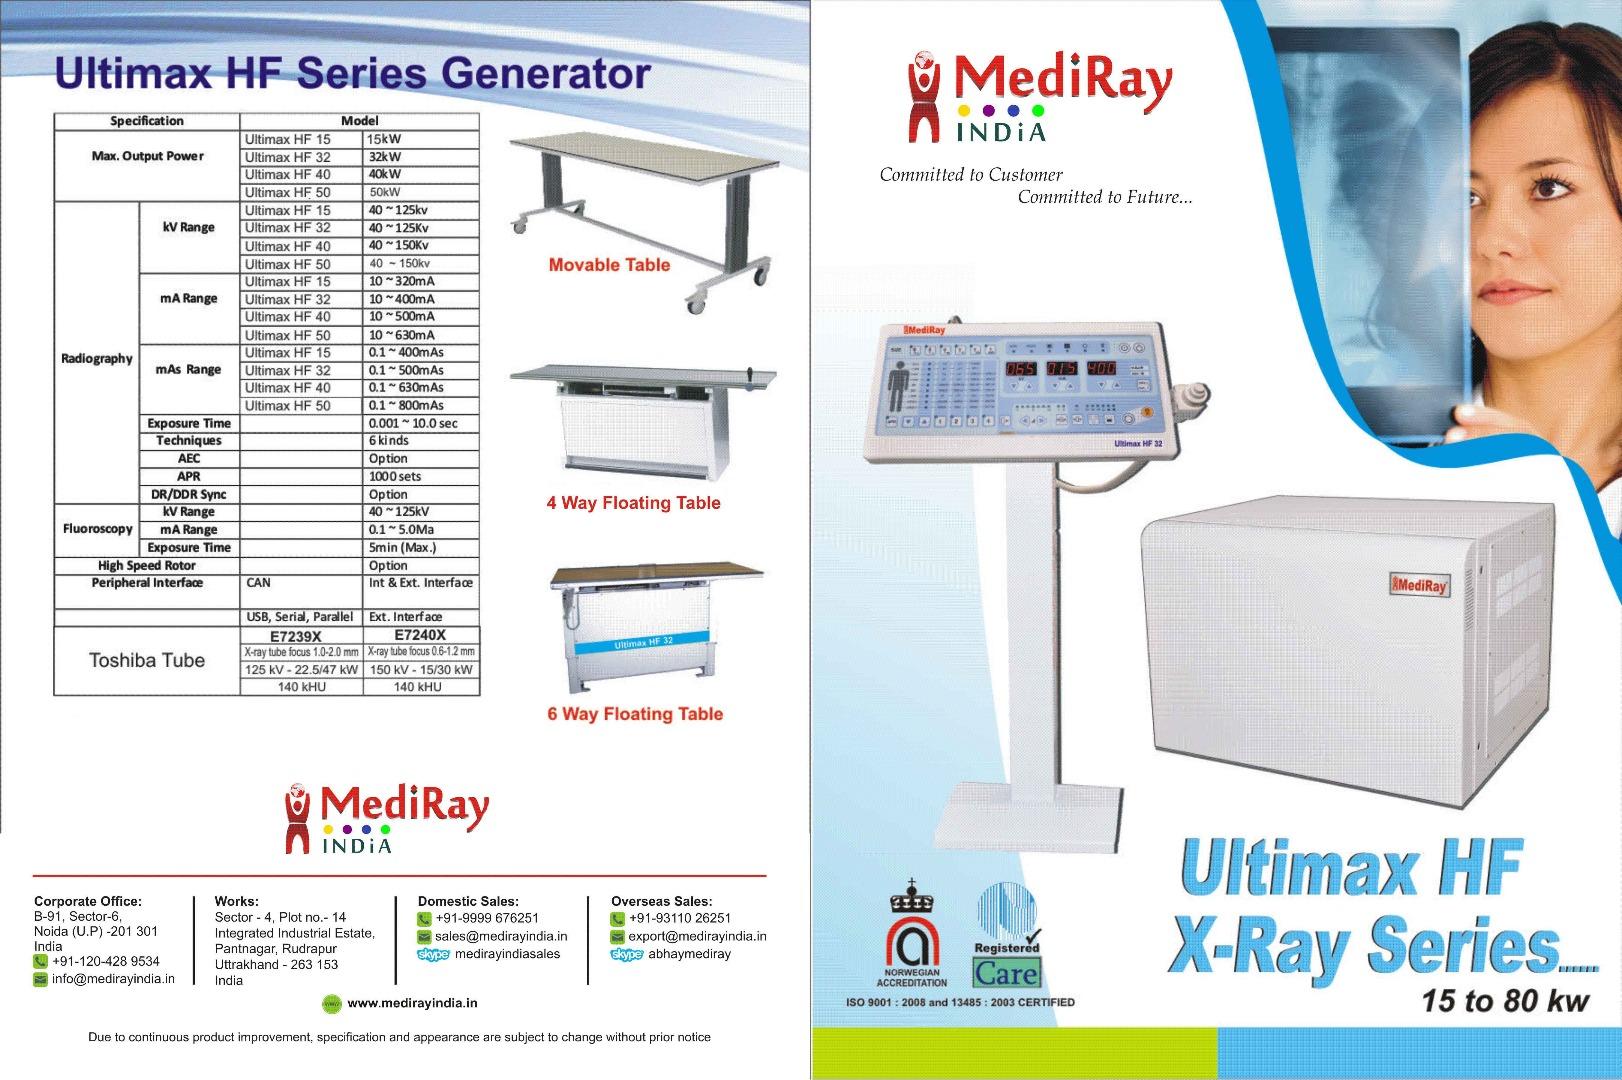 MediRay (India)